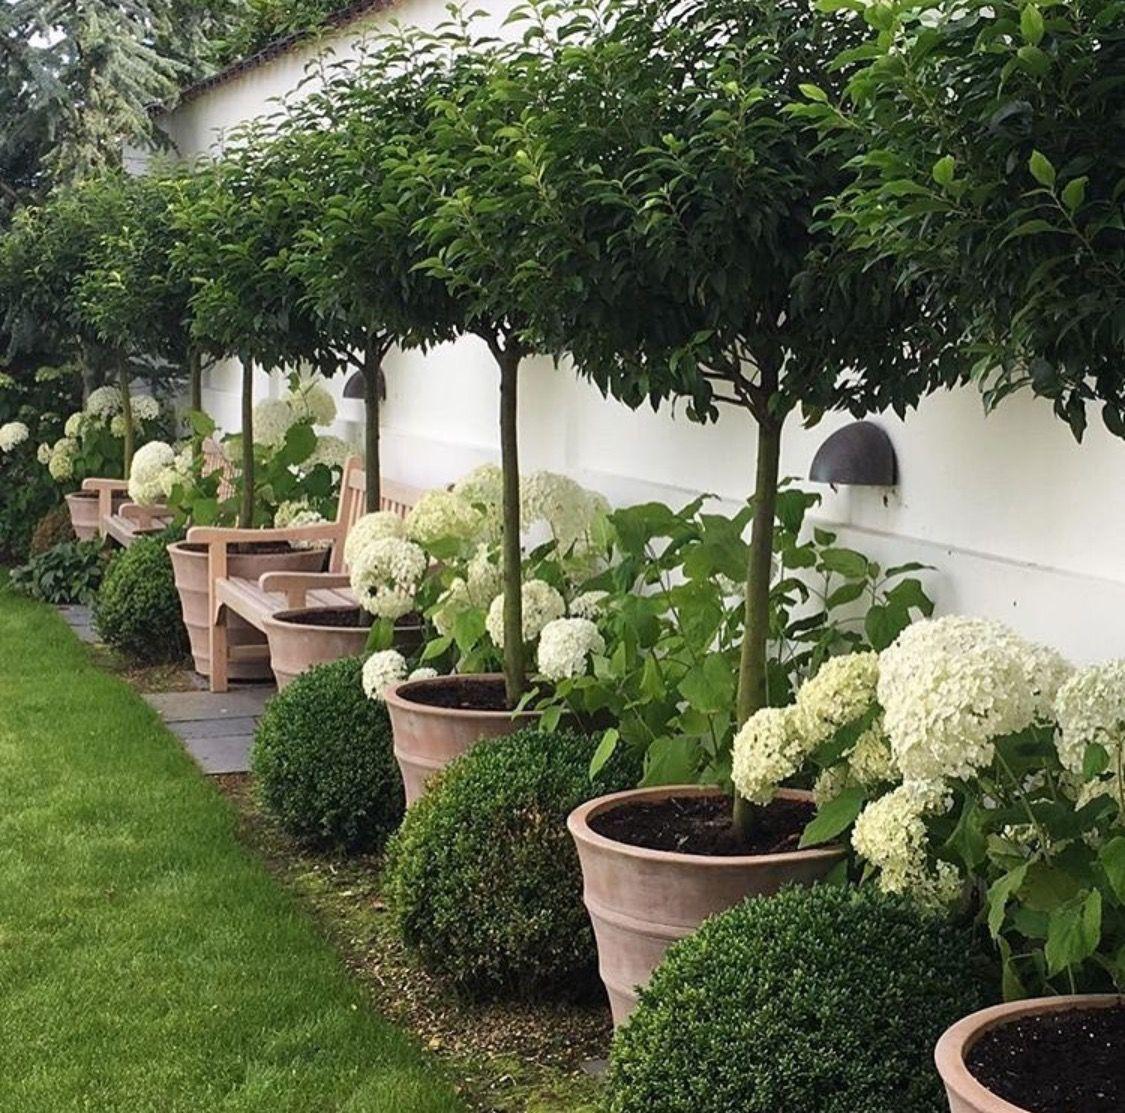 Dividing Wall With Mad Style Diy Backyard Landscaping Backyard Garden Design Outdoor Gardens